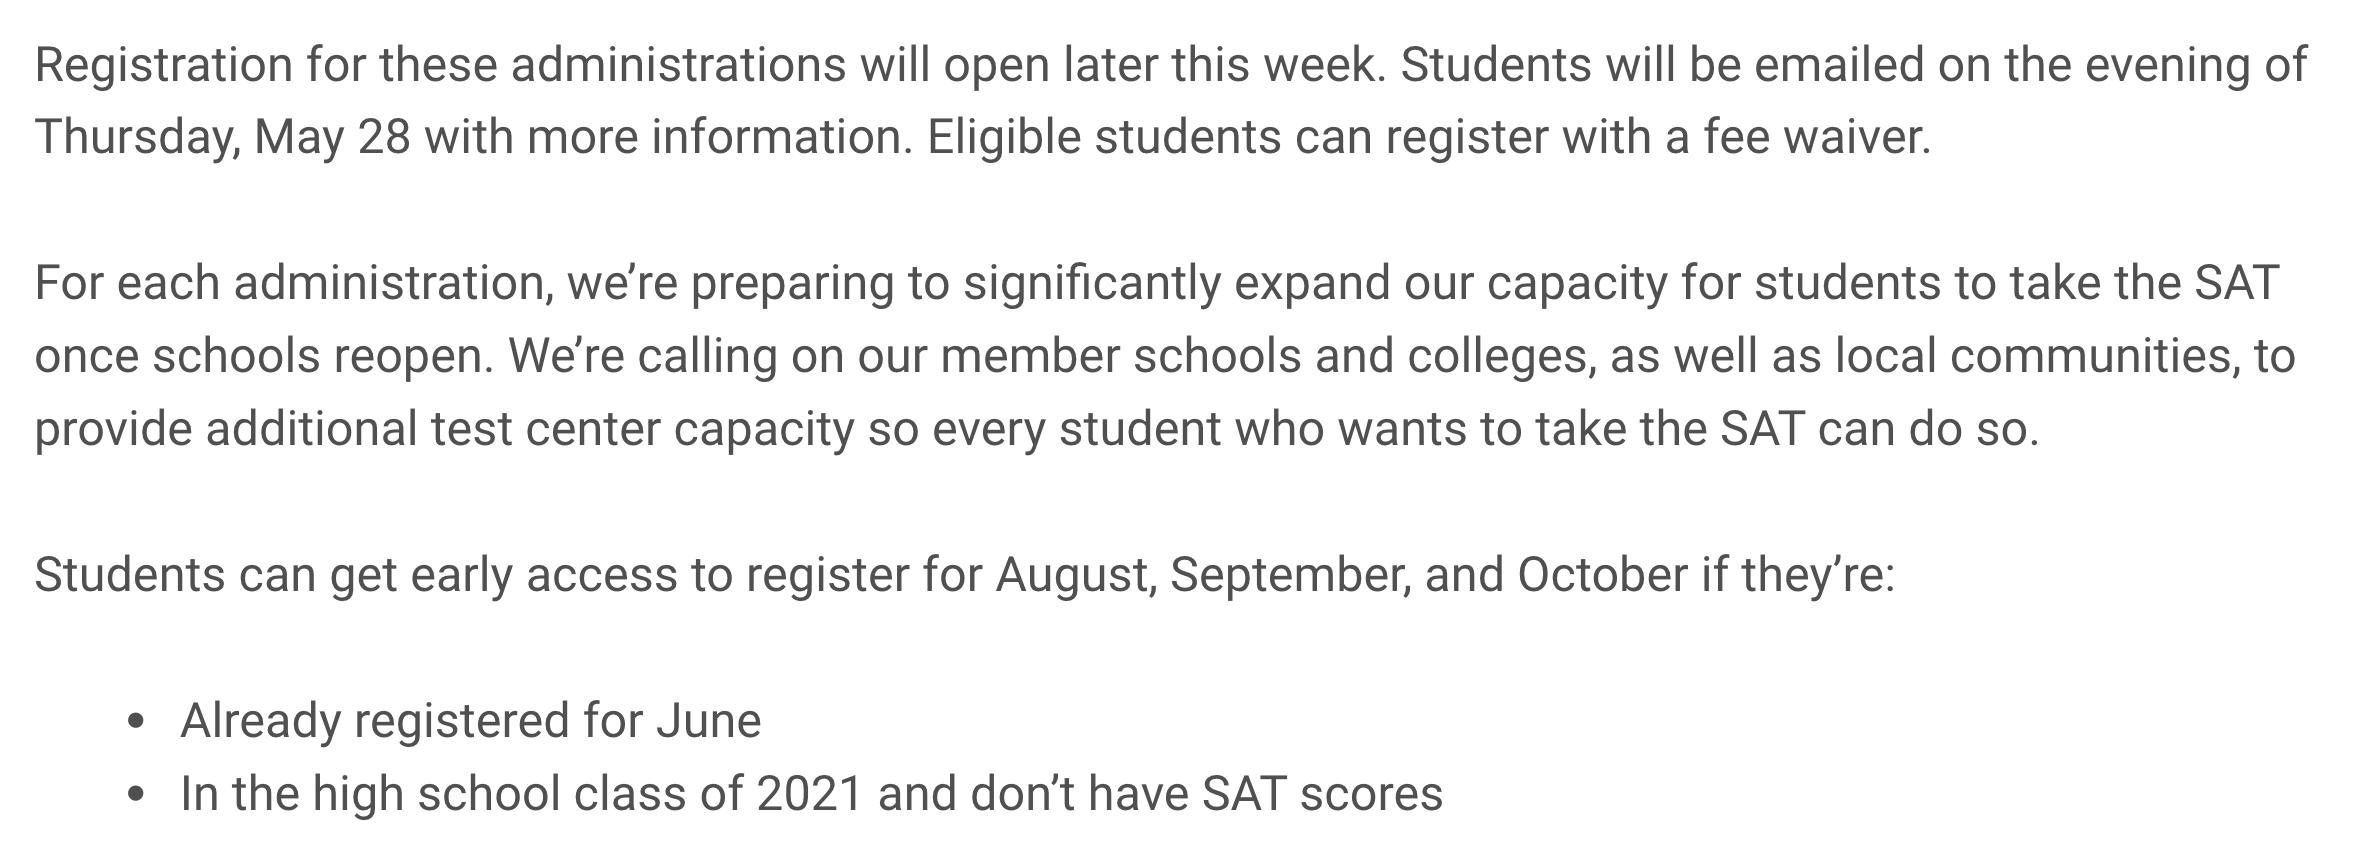 CB发布2020年下半年SAT报考时间/5月28号放考位通知,确定增加11月亚太SAT2考试!-2020年SAT/SAT2考试时间表